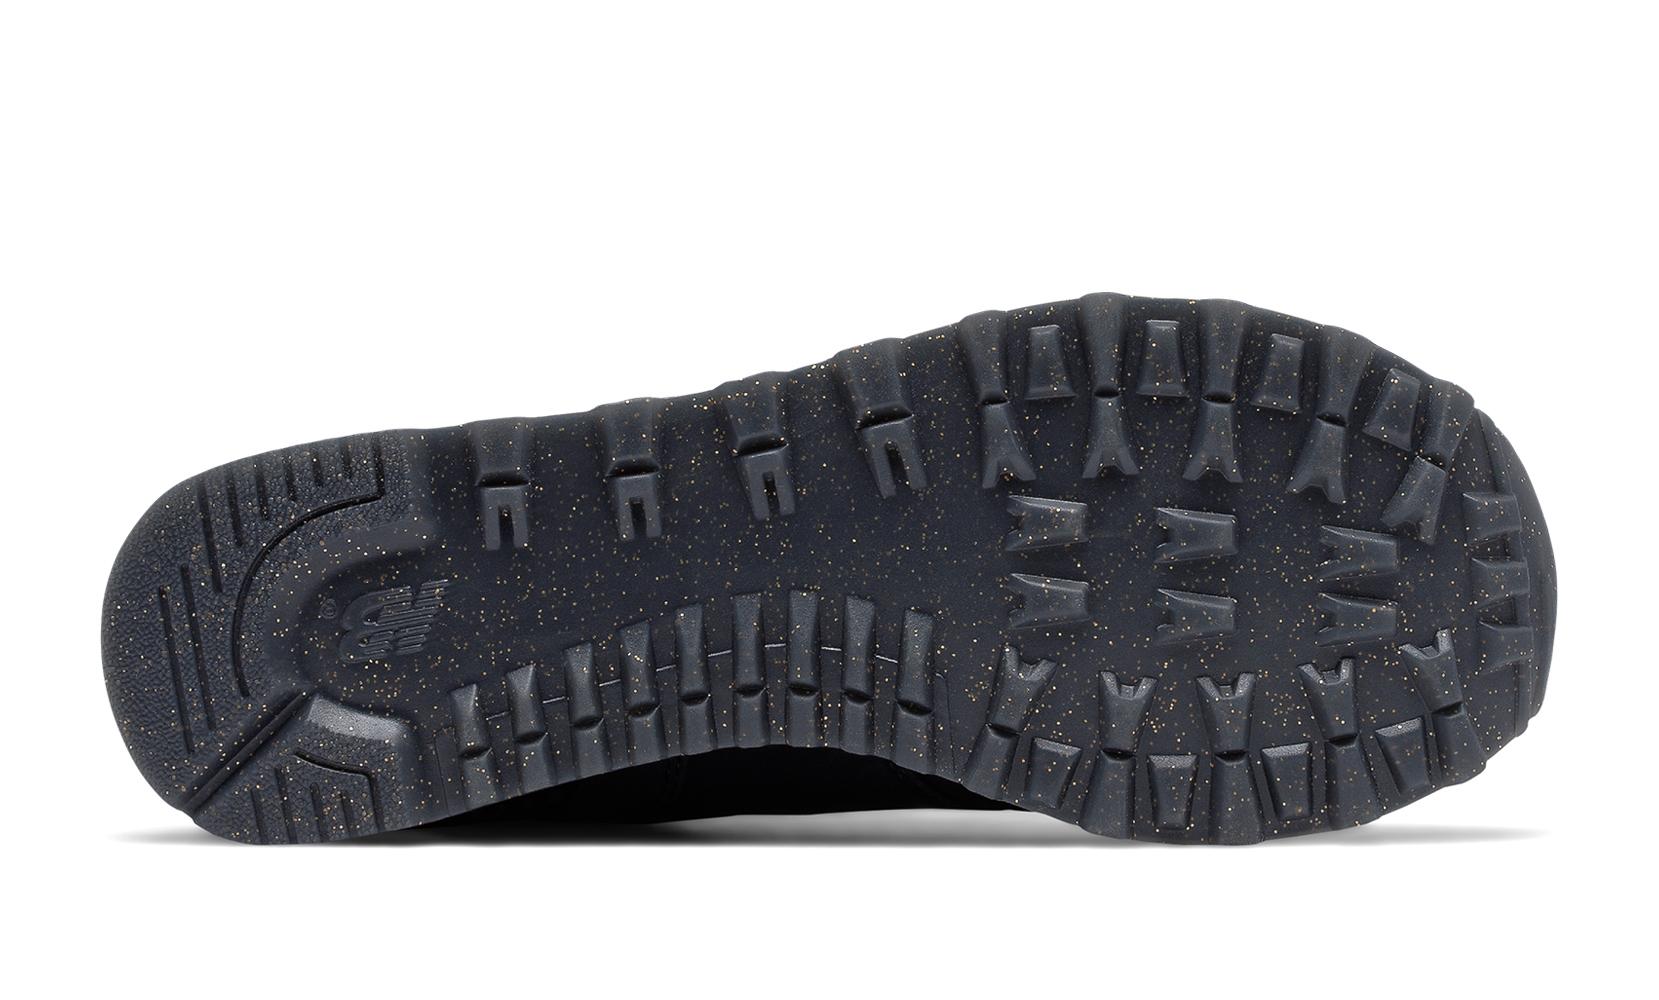 online store 8f387 0fe4d Жіноче взуття повсякденне New Balance 574 WL574MTC   New Balance